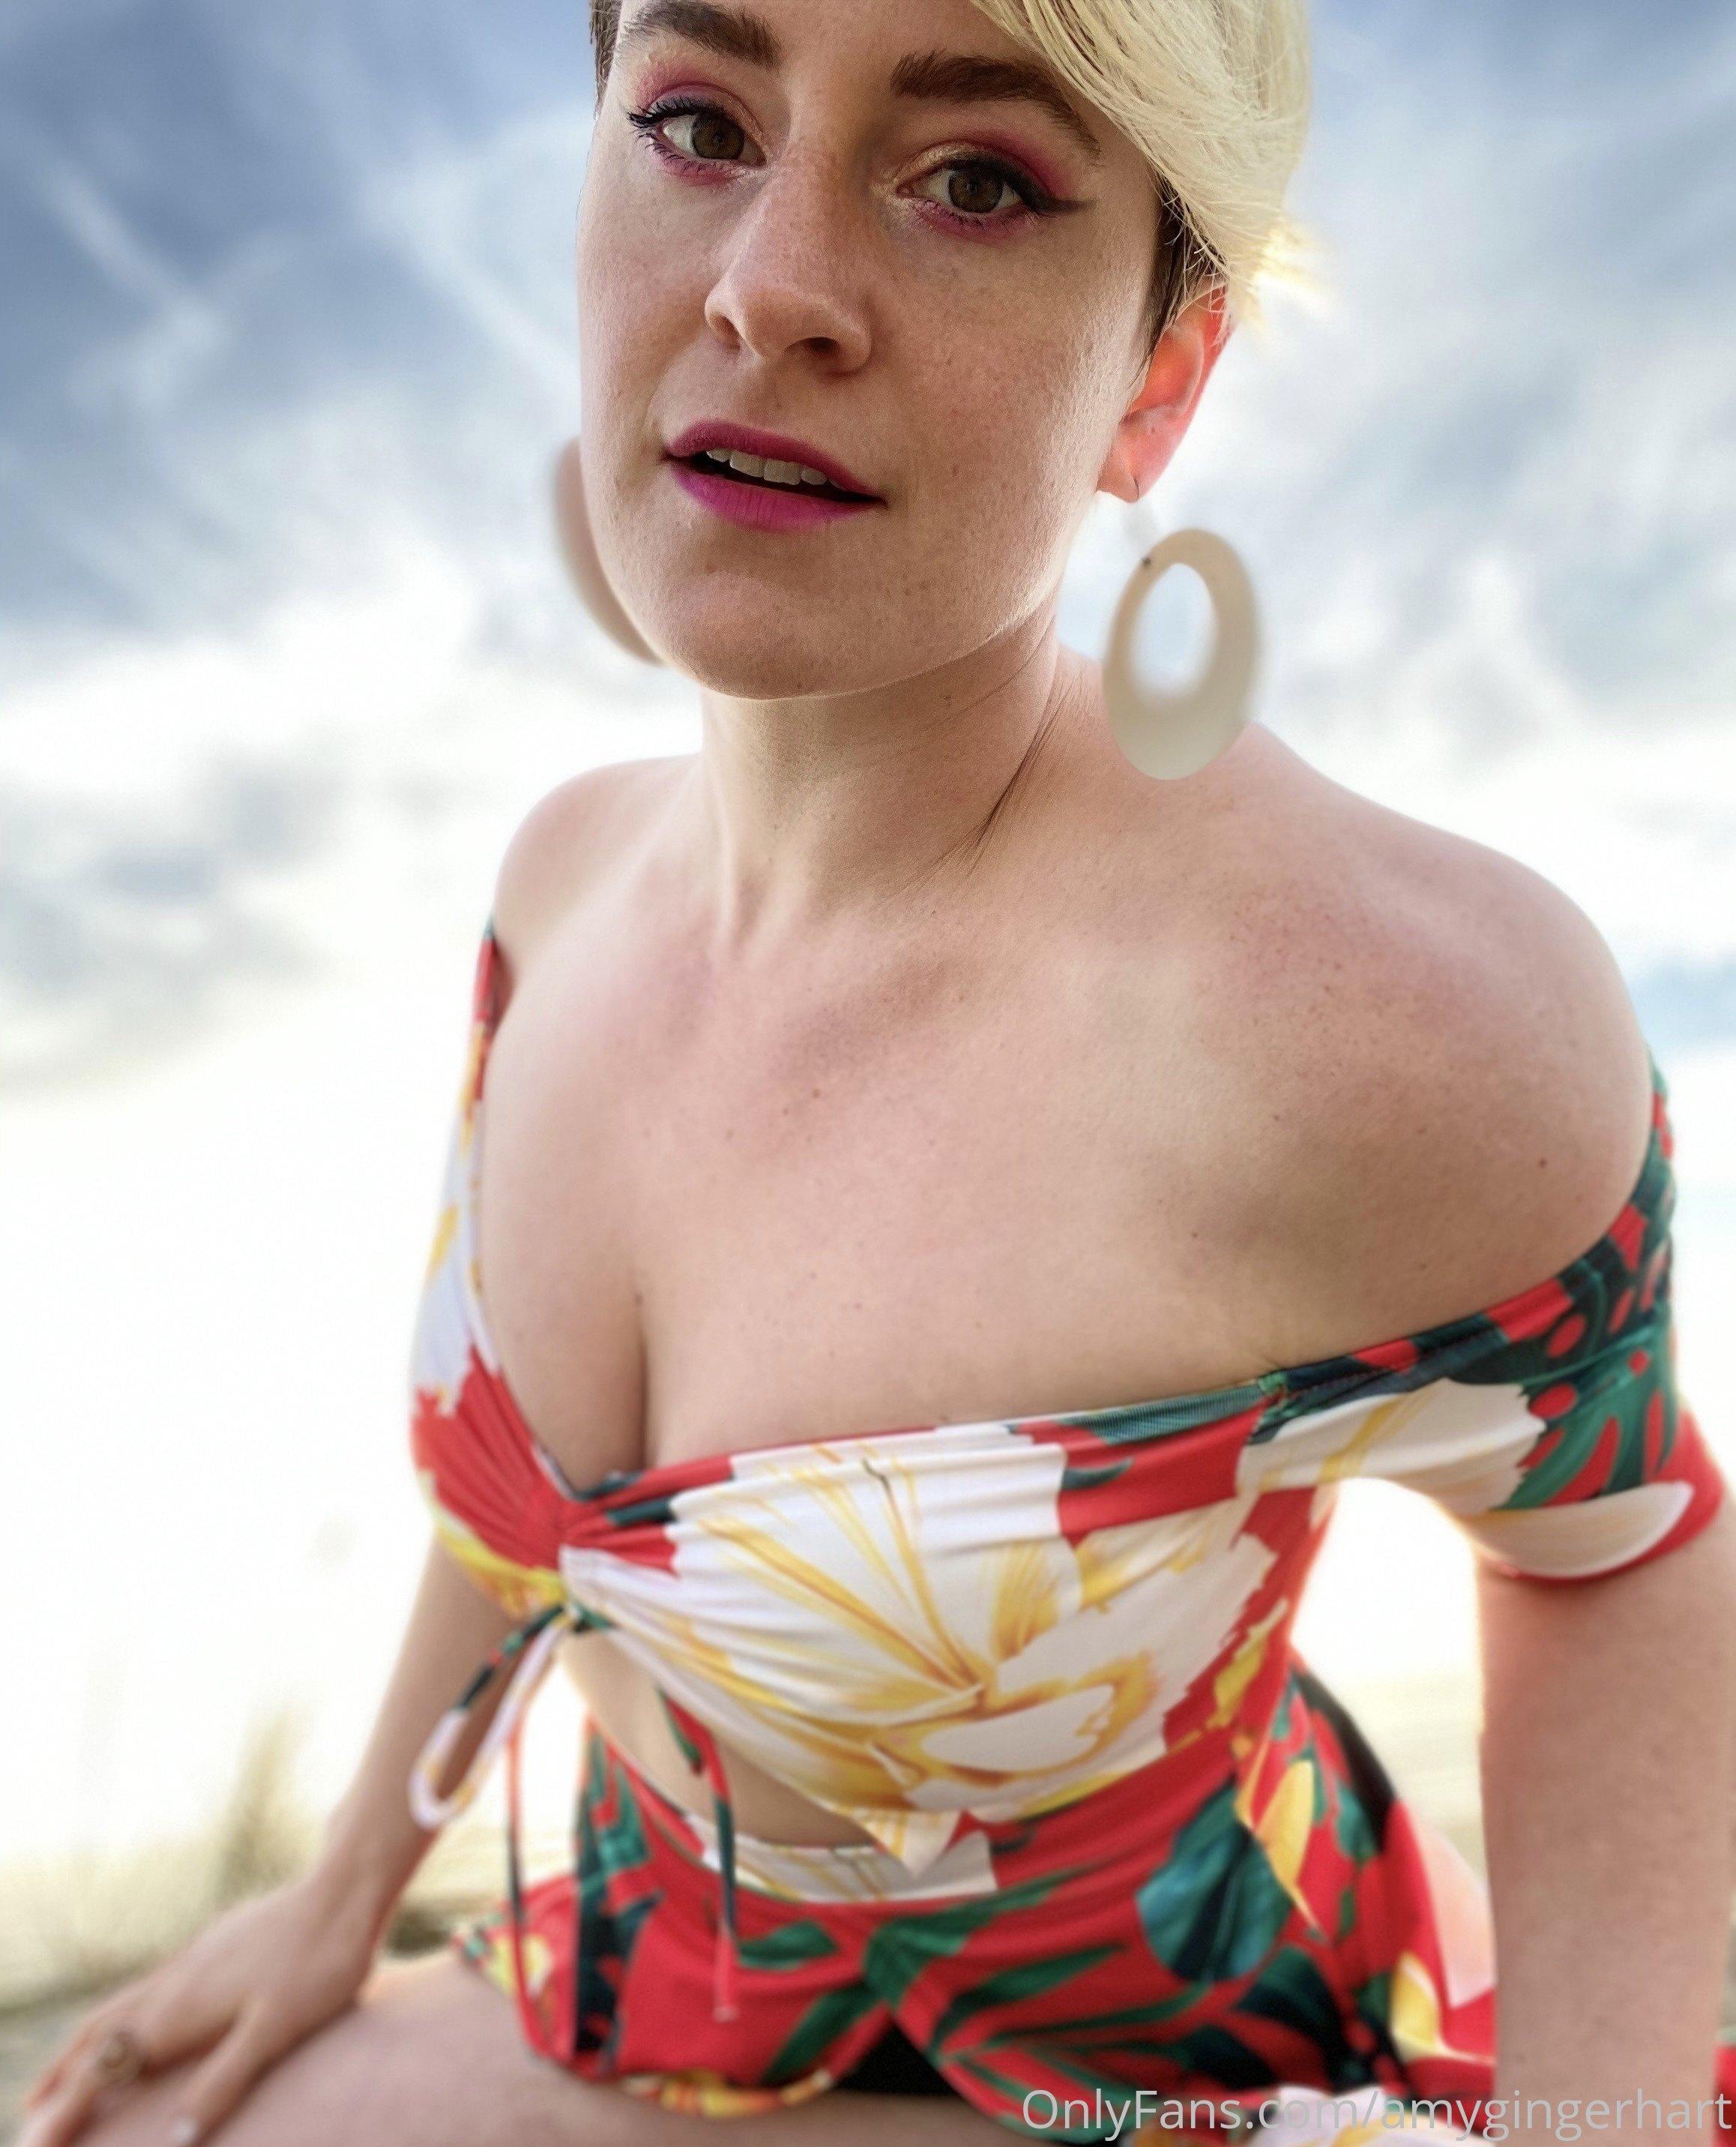 Amy Hart, Amygingerhart, Onlyfans 0151